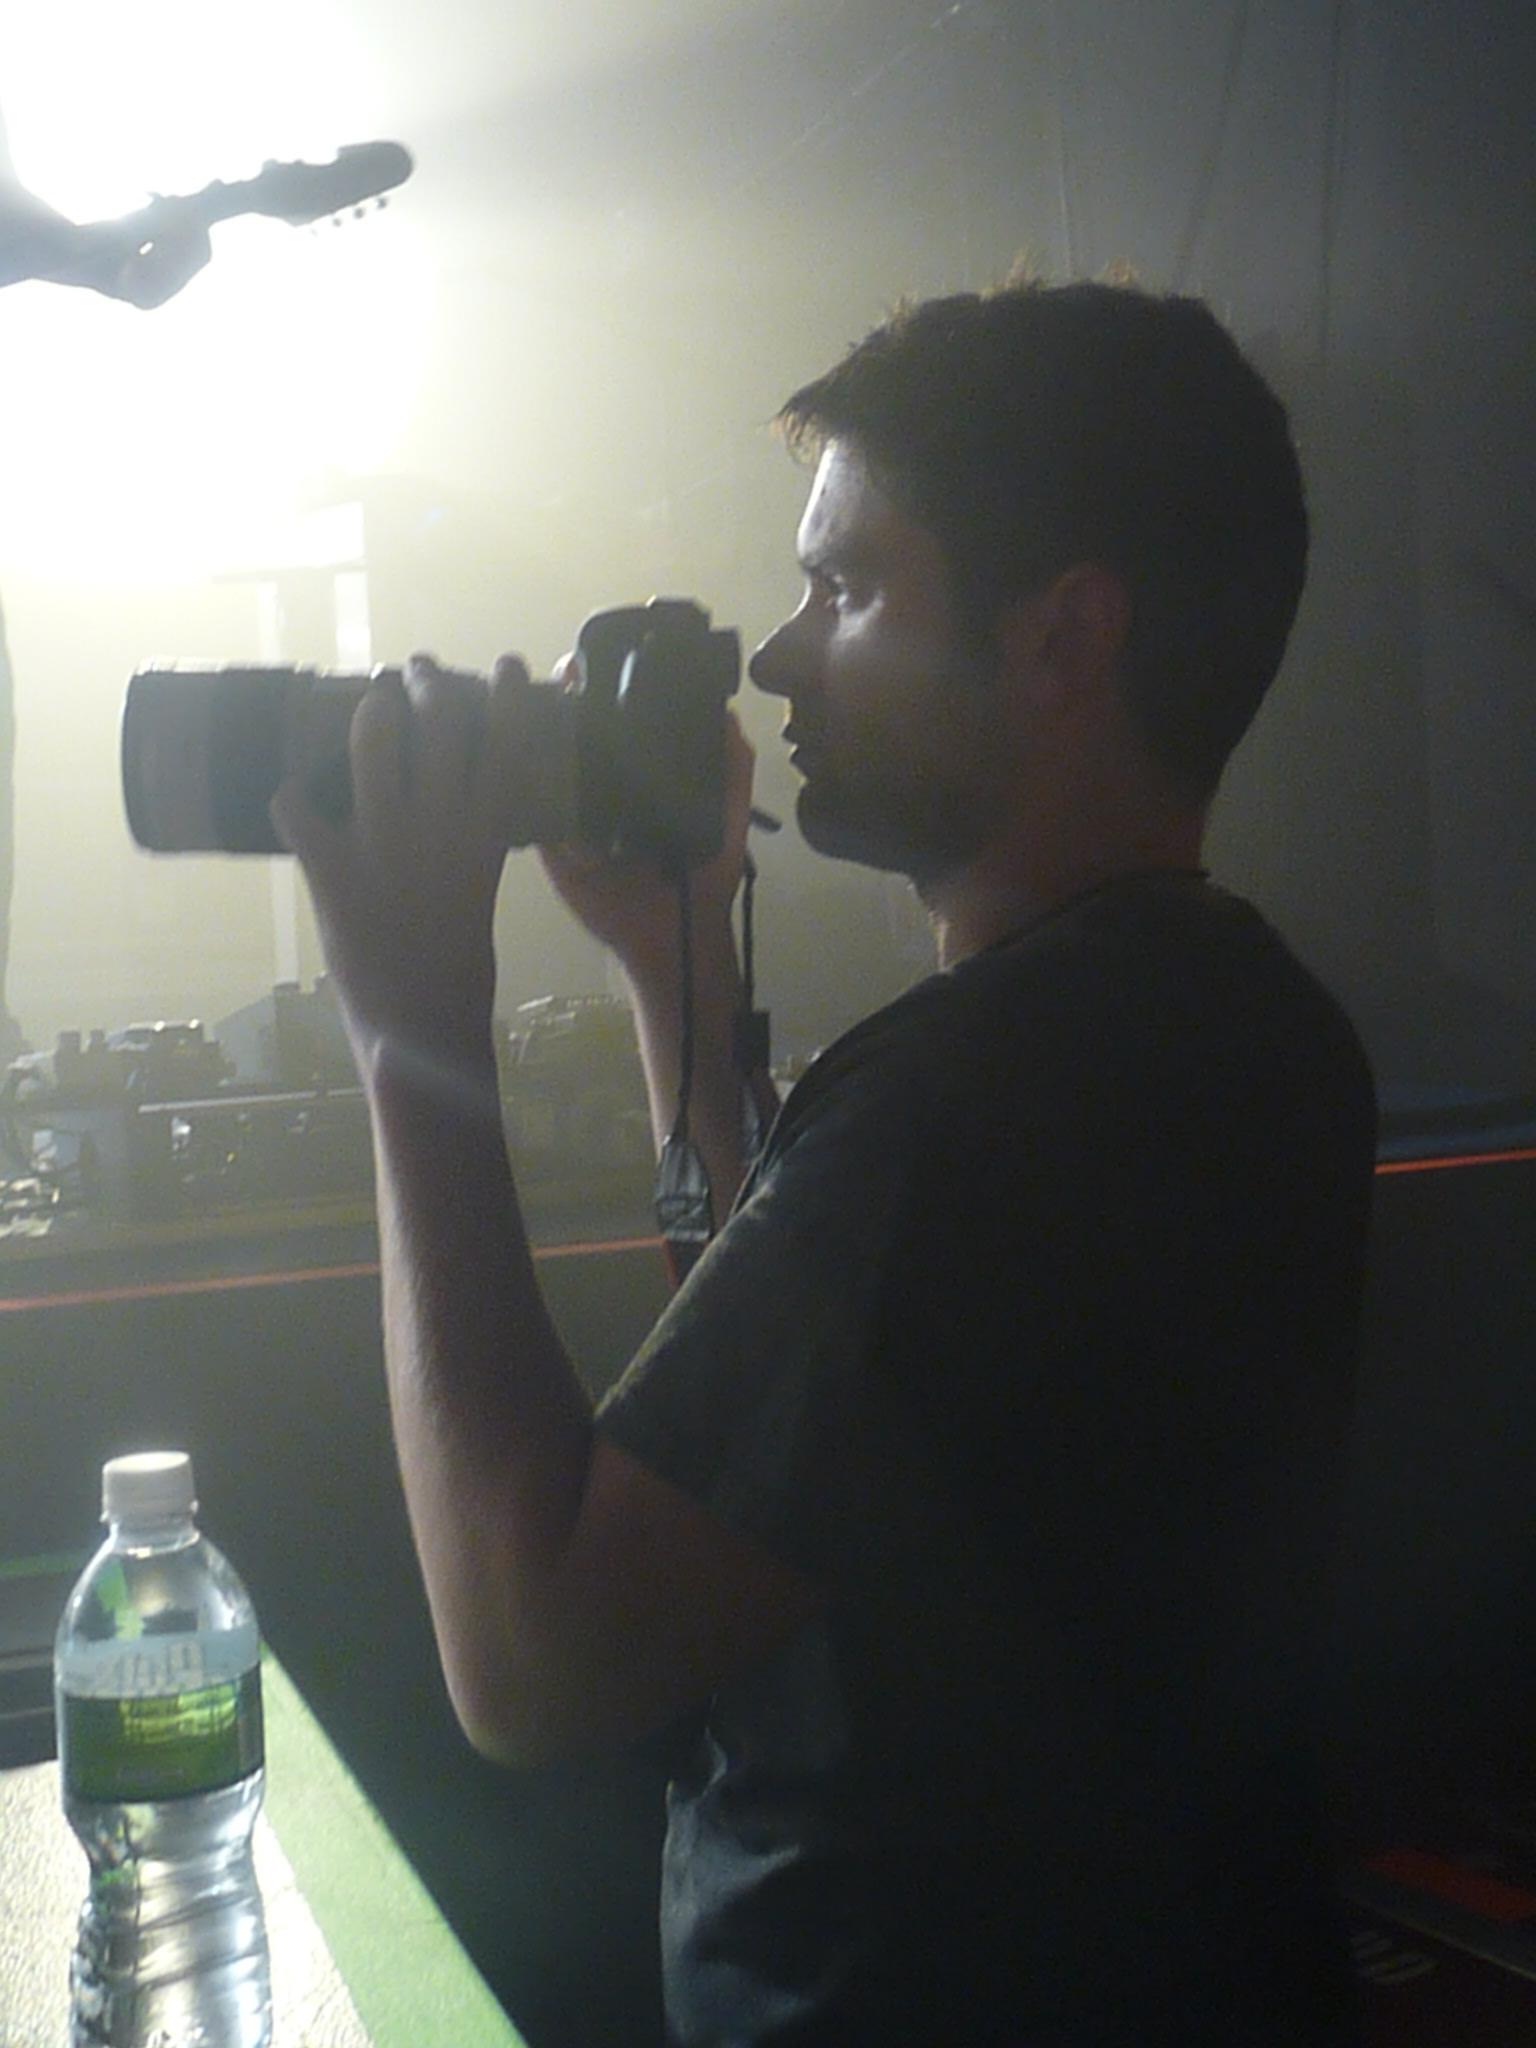 Image of Rob Sheridan from Wikidata